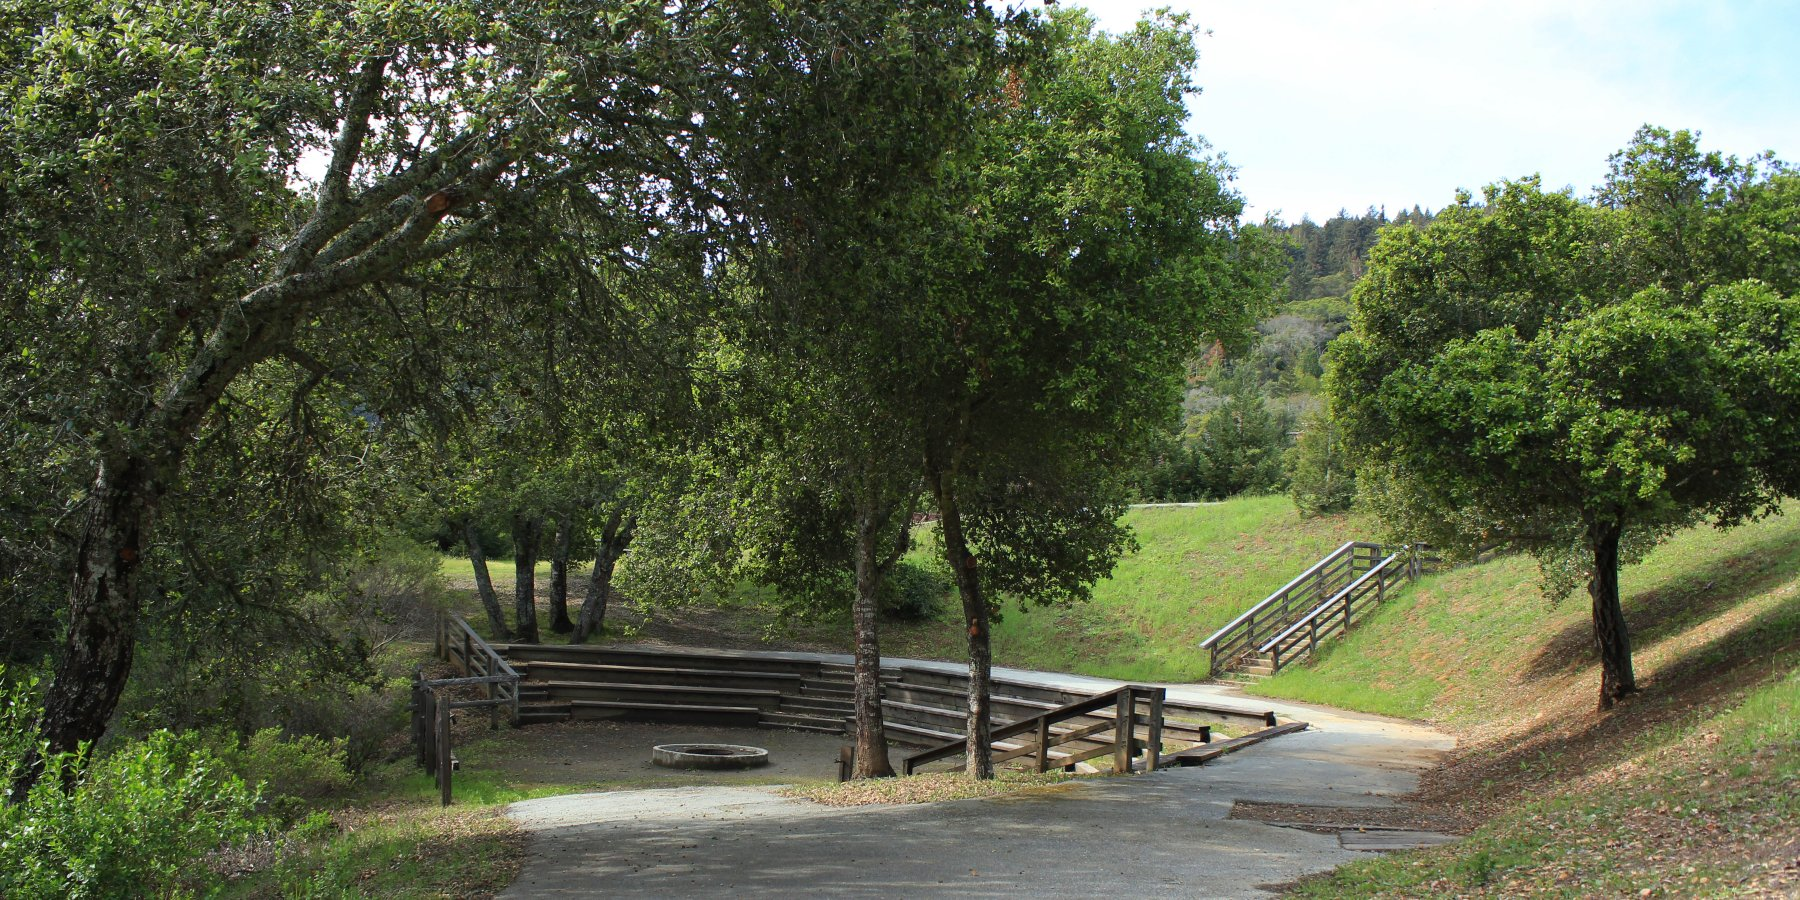 huddart park picnic event venue